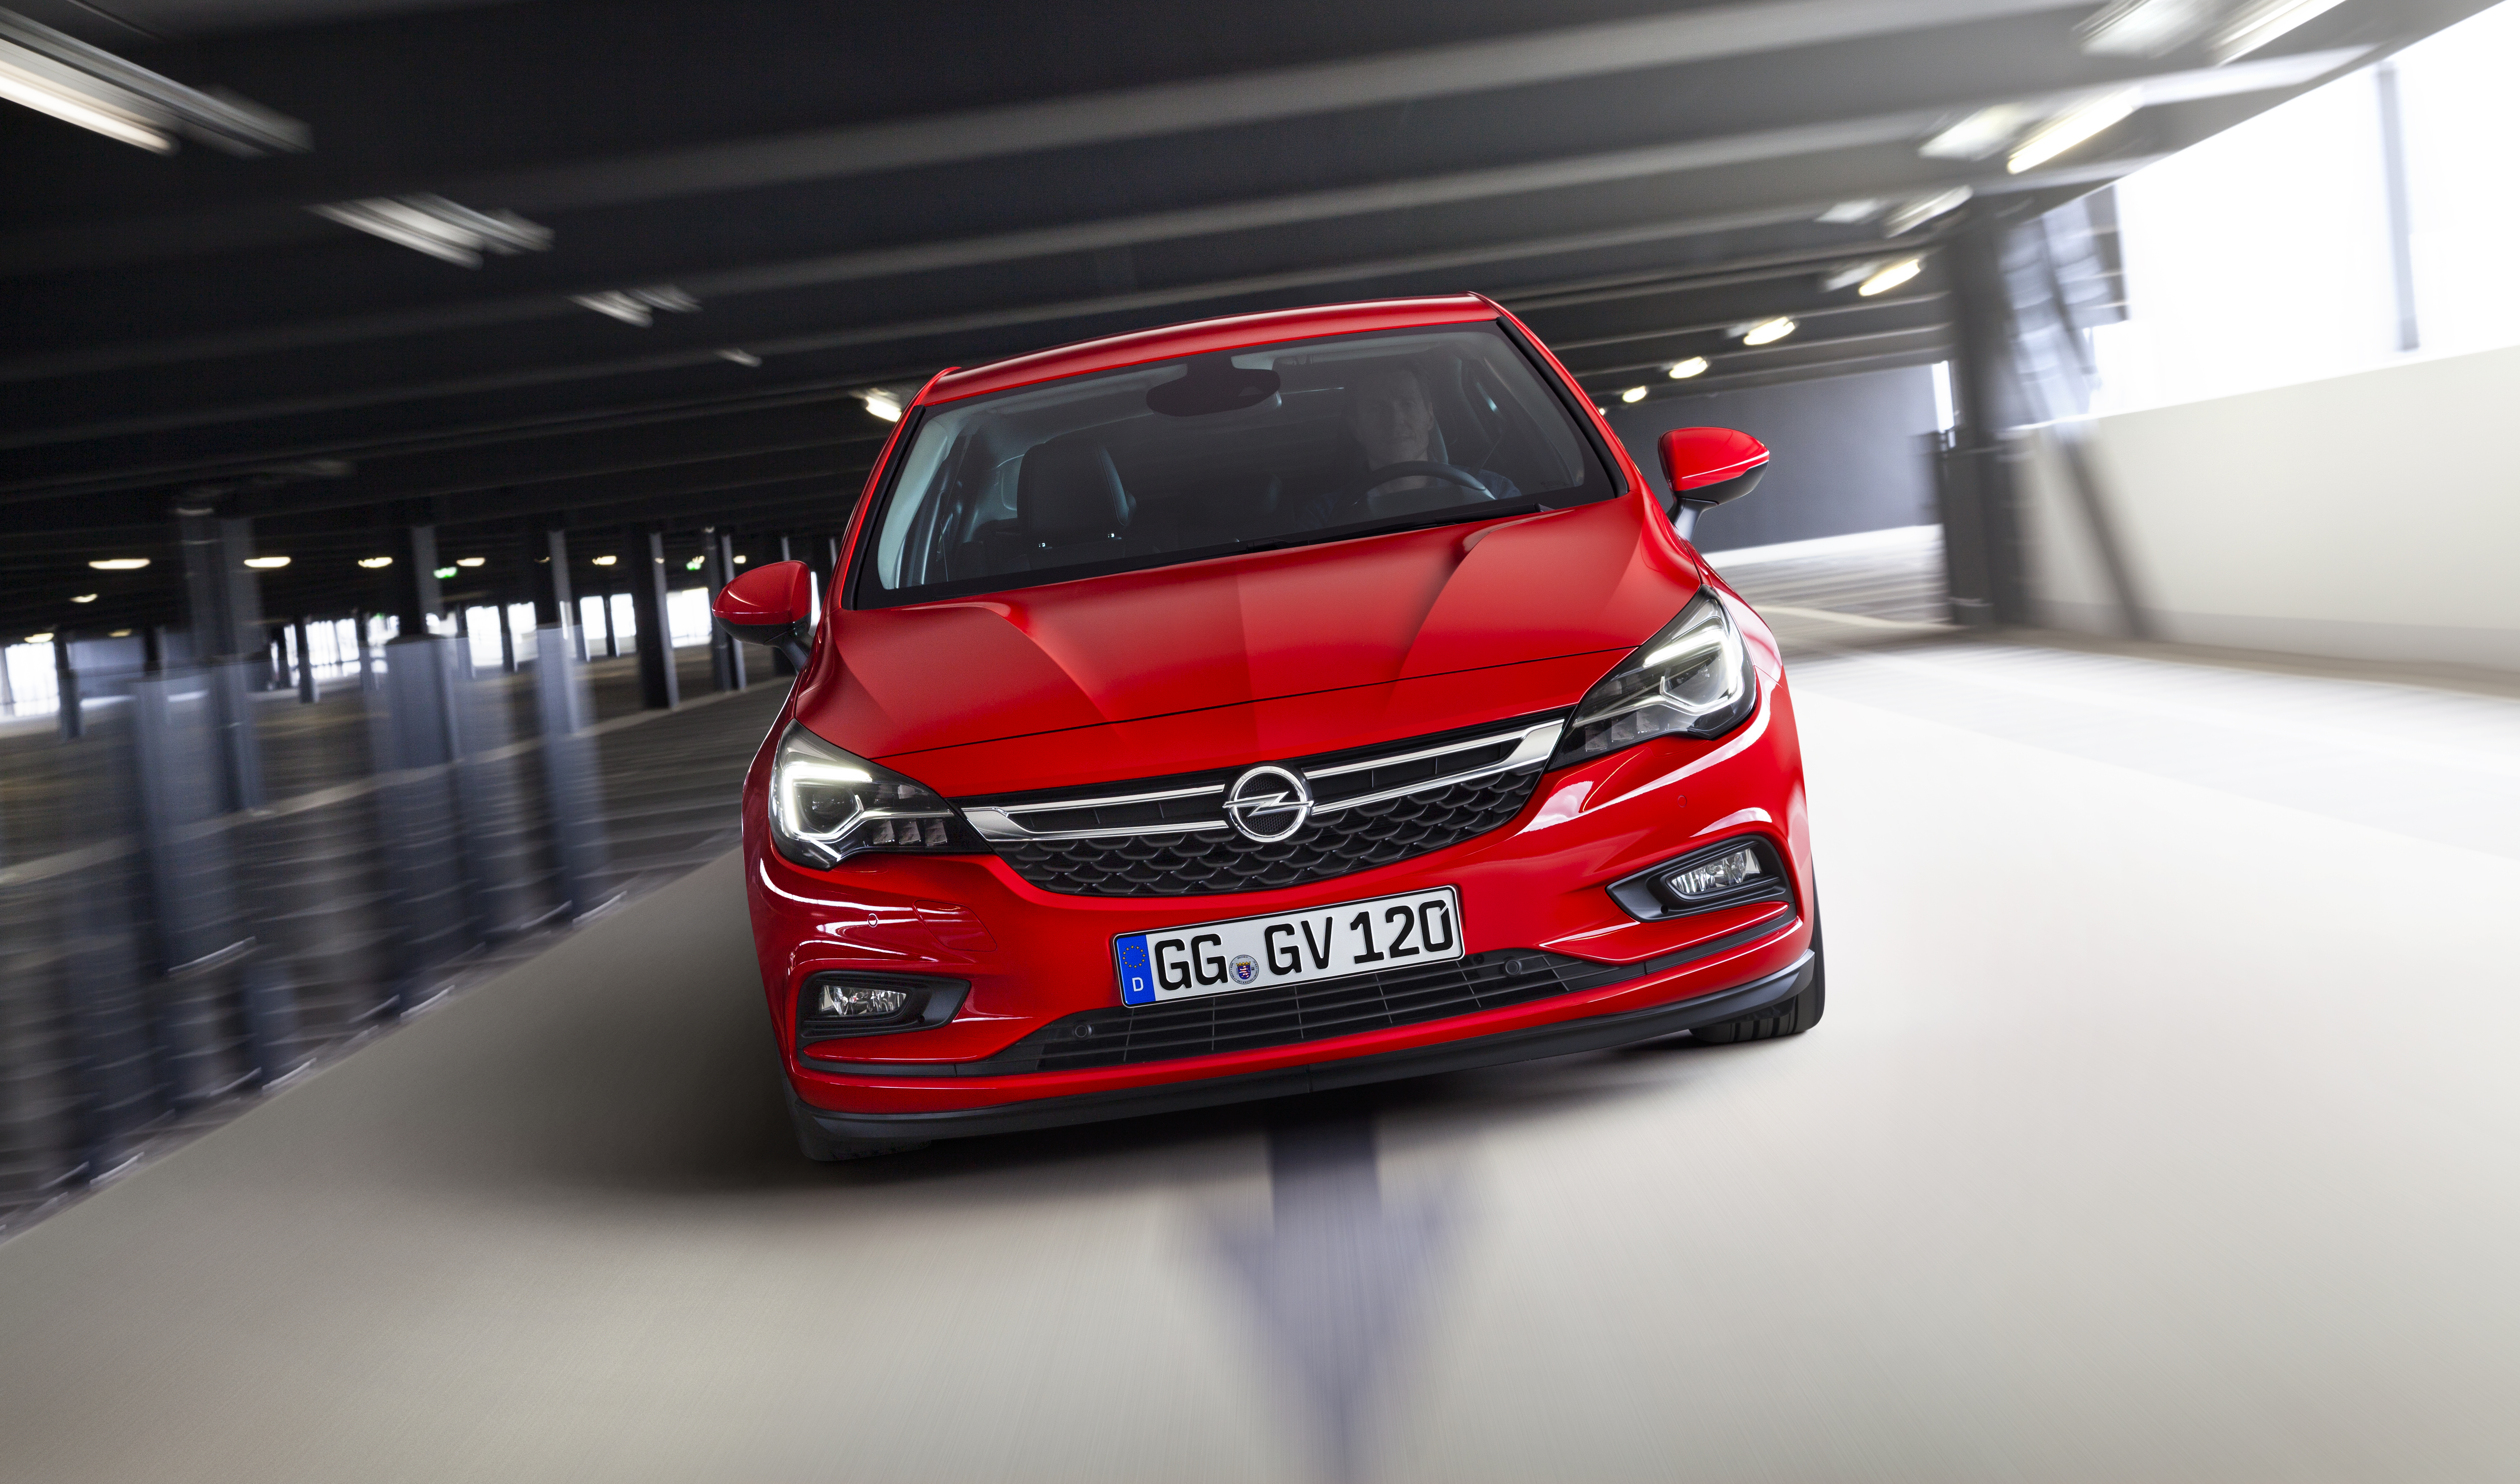 Nuova Opel Astra: leggerissima!